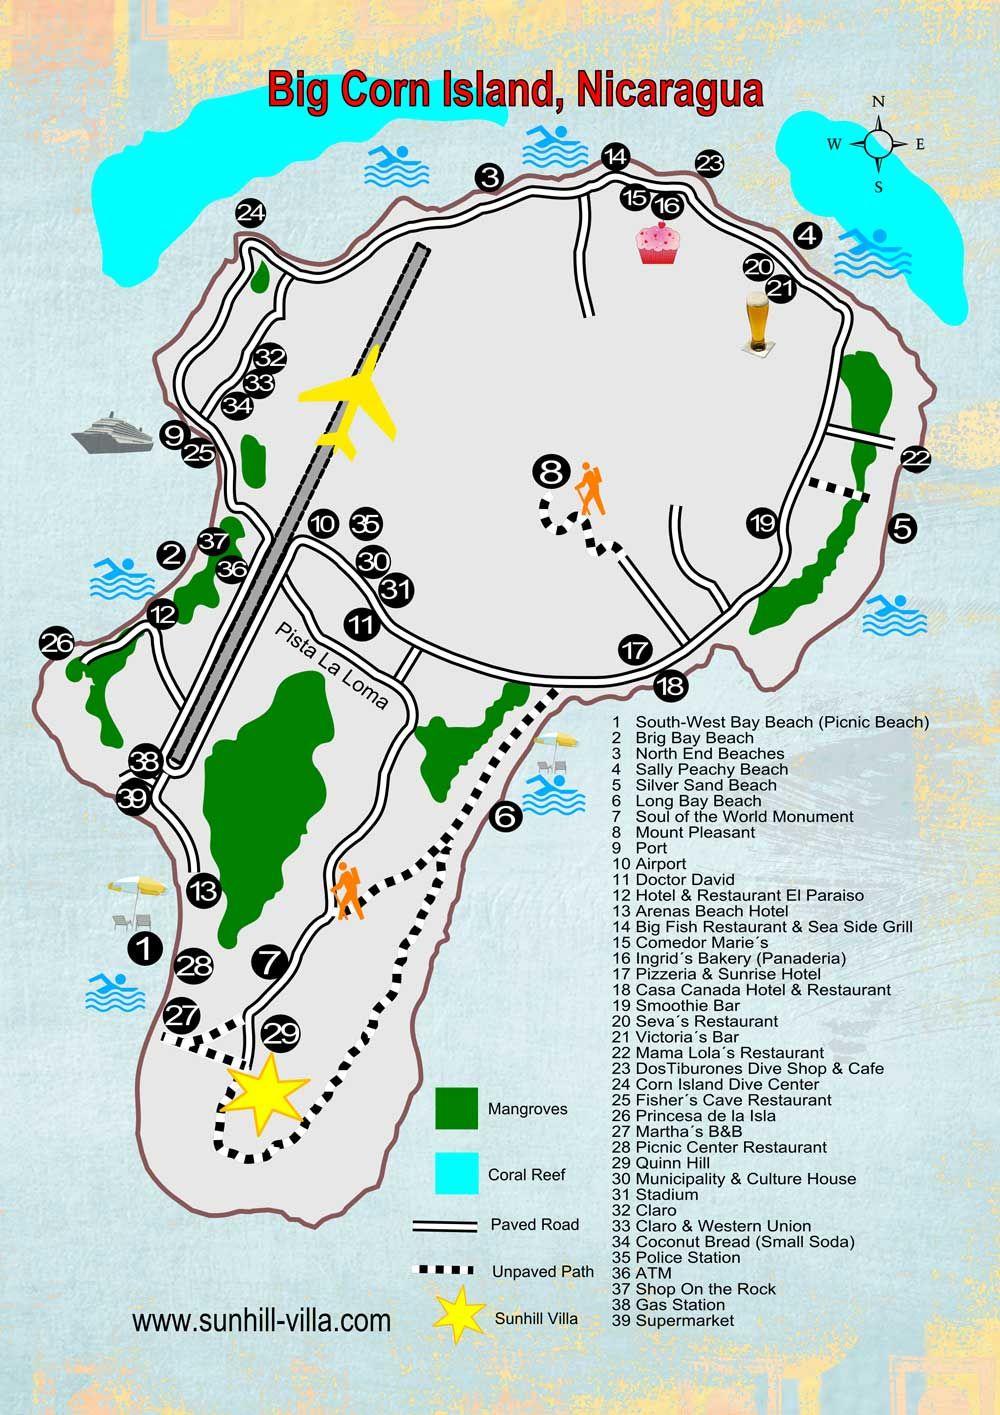 Corn Island Nicaragua Big Corn Island Map  Nicaragua  Pinterest